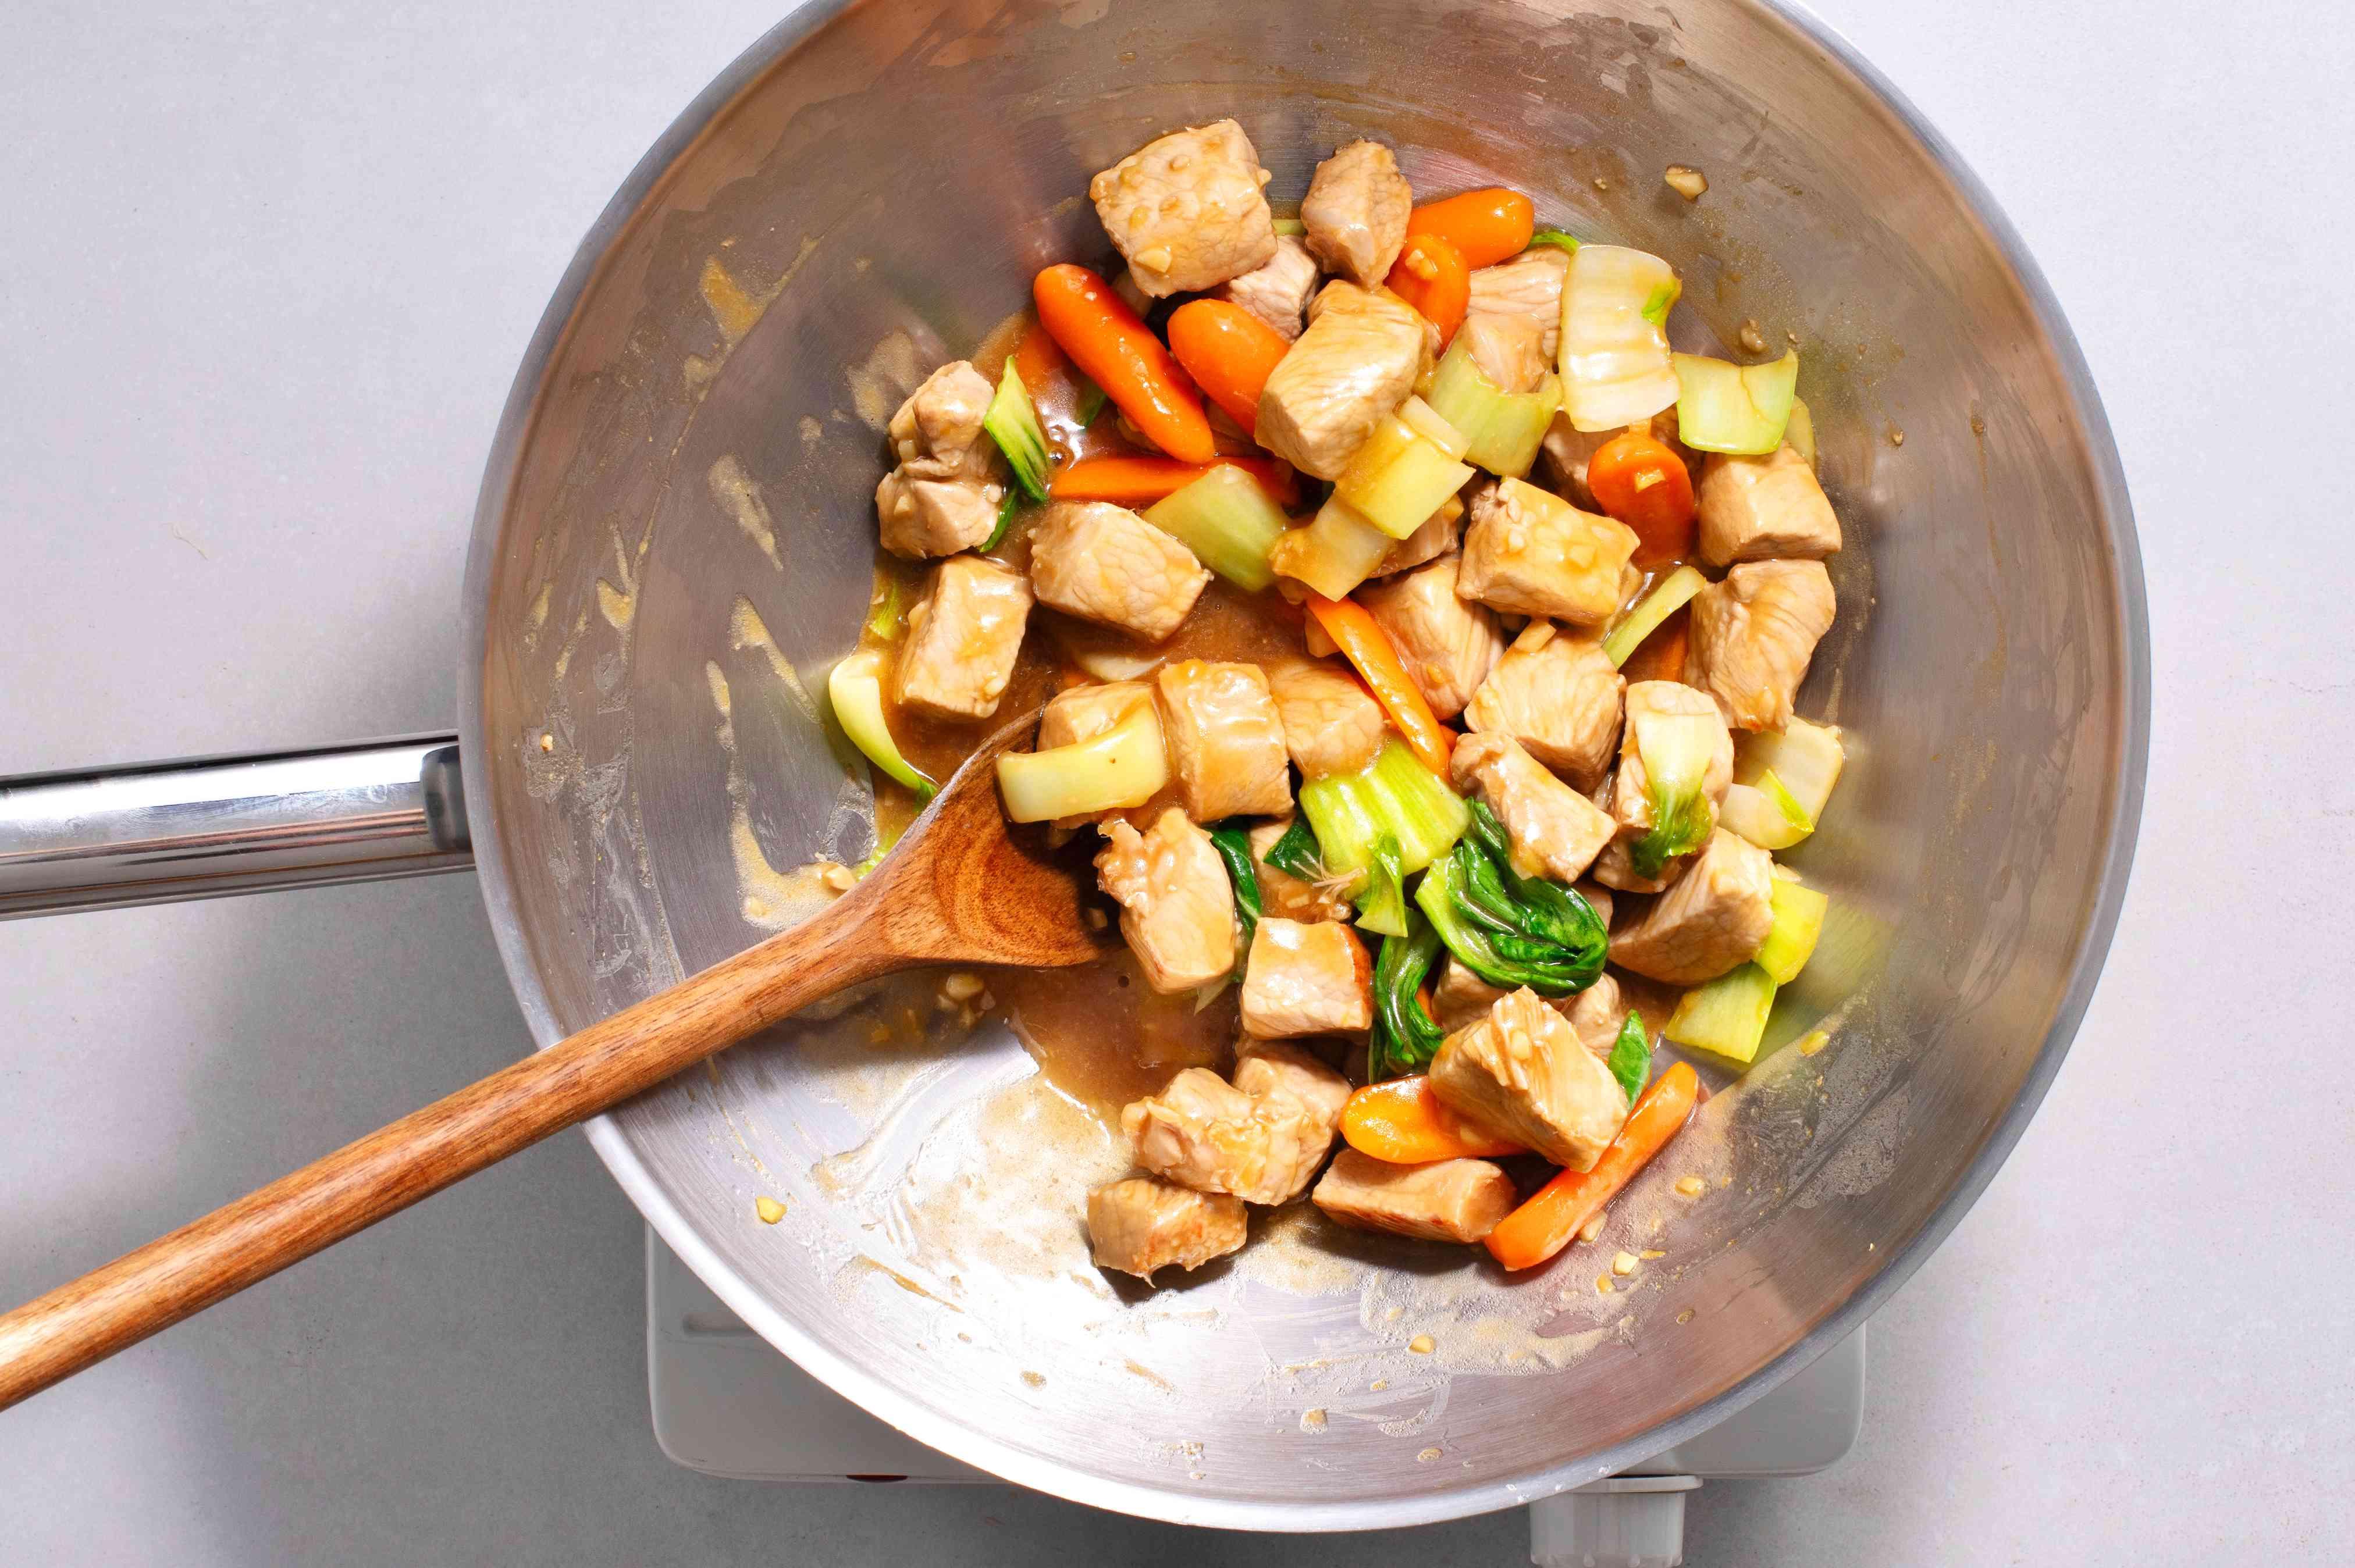 Chinese Orange Pork Chop Stir-fry cooking in a wok